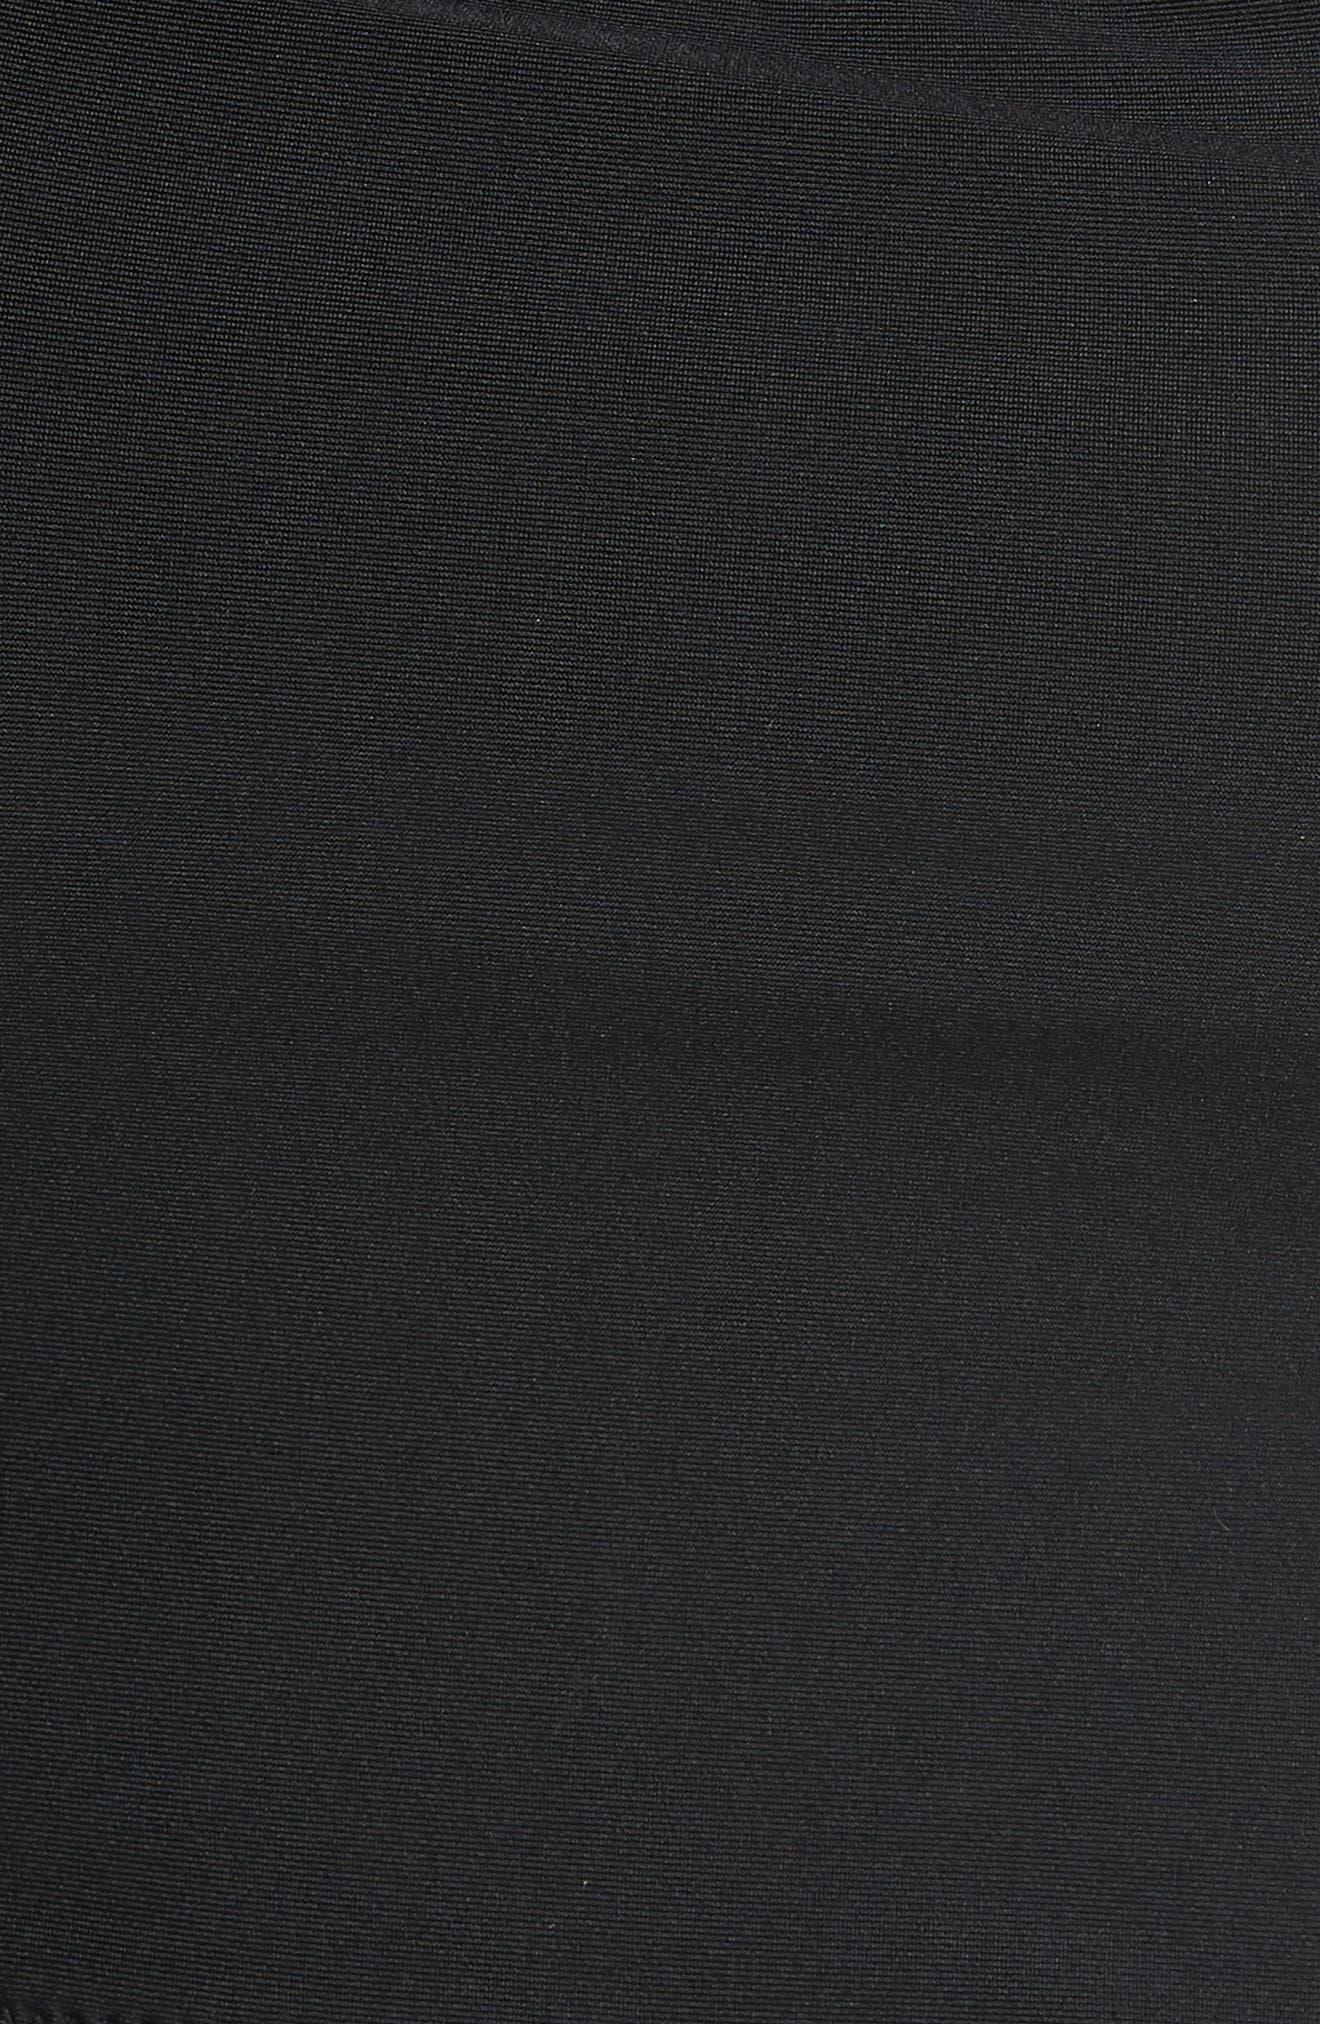 Marilyn Peplum Tankini Top,                             Alternate thumbnail 6, color,                             BLACK